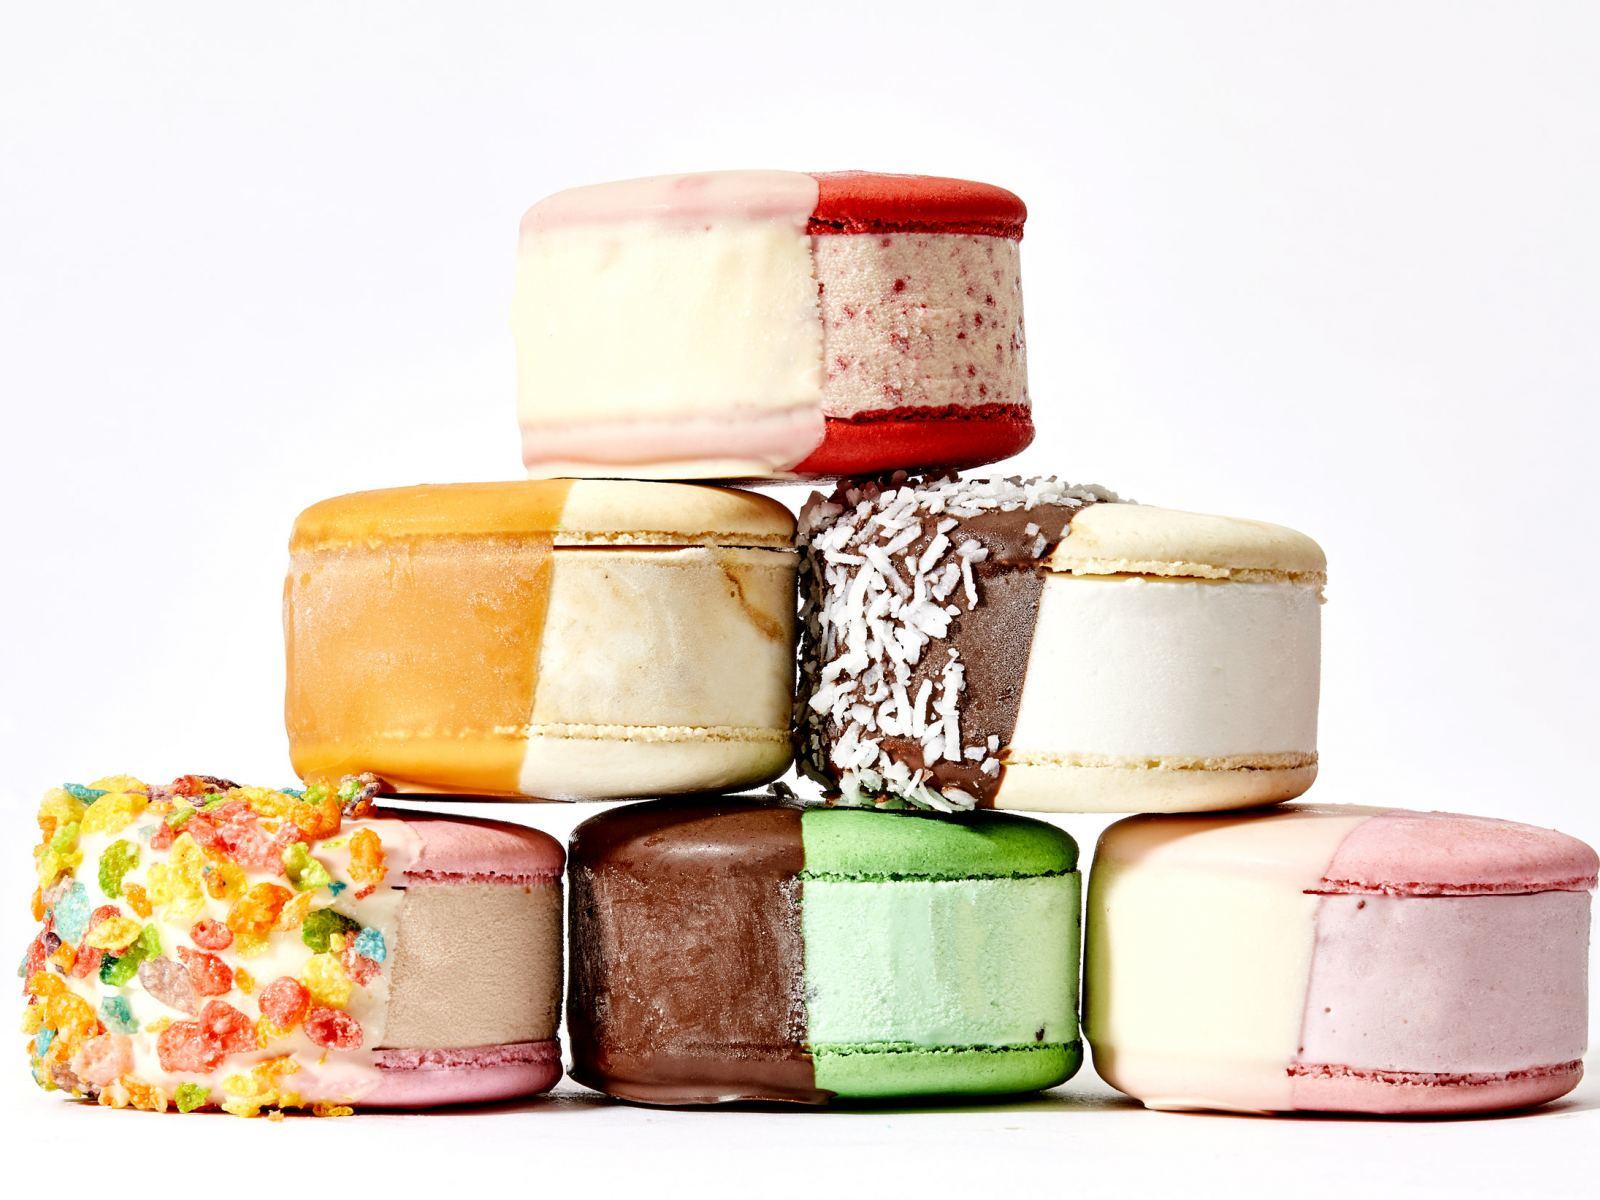 MILK Ice Cream Gelato Macaron